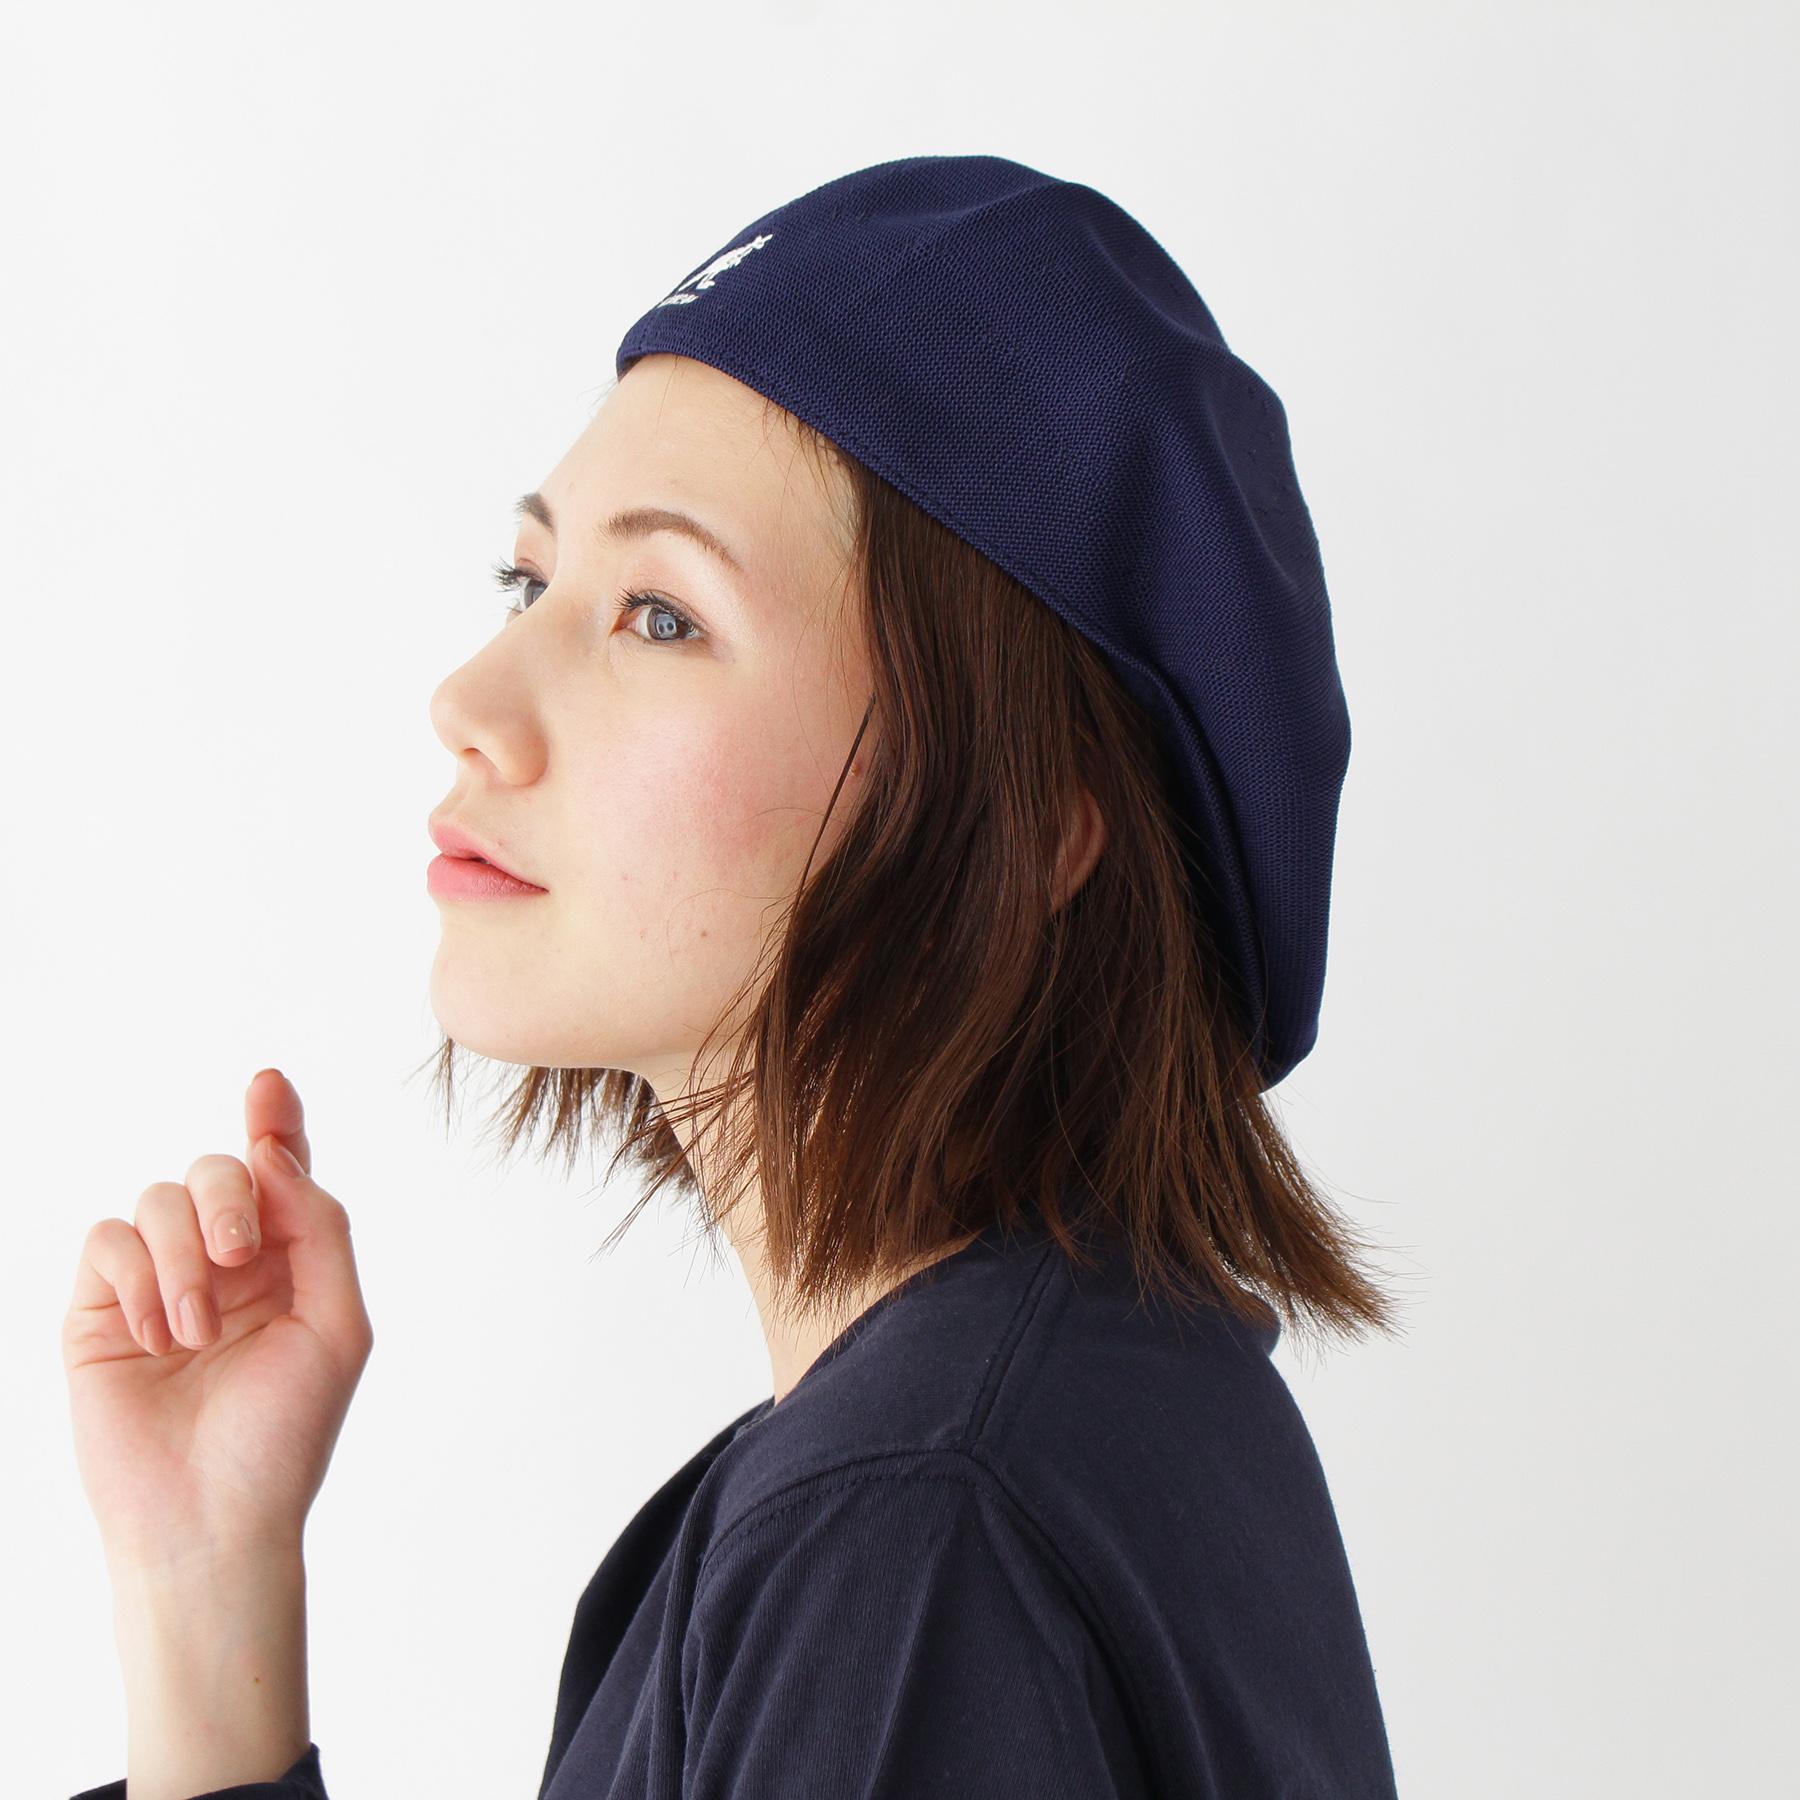 【BASECONTROL LADYS (ベース コントロール レディス)】【WEB限定】KANGOL/カンゴール Galaxy ハンチングレディース 帽子|ハンチング・ベレー帽 ネイビー